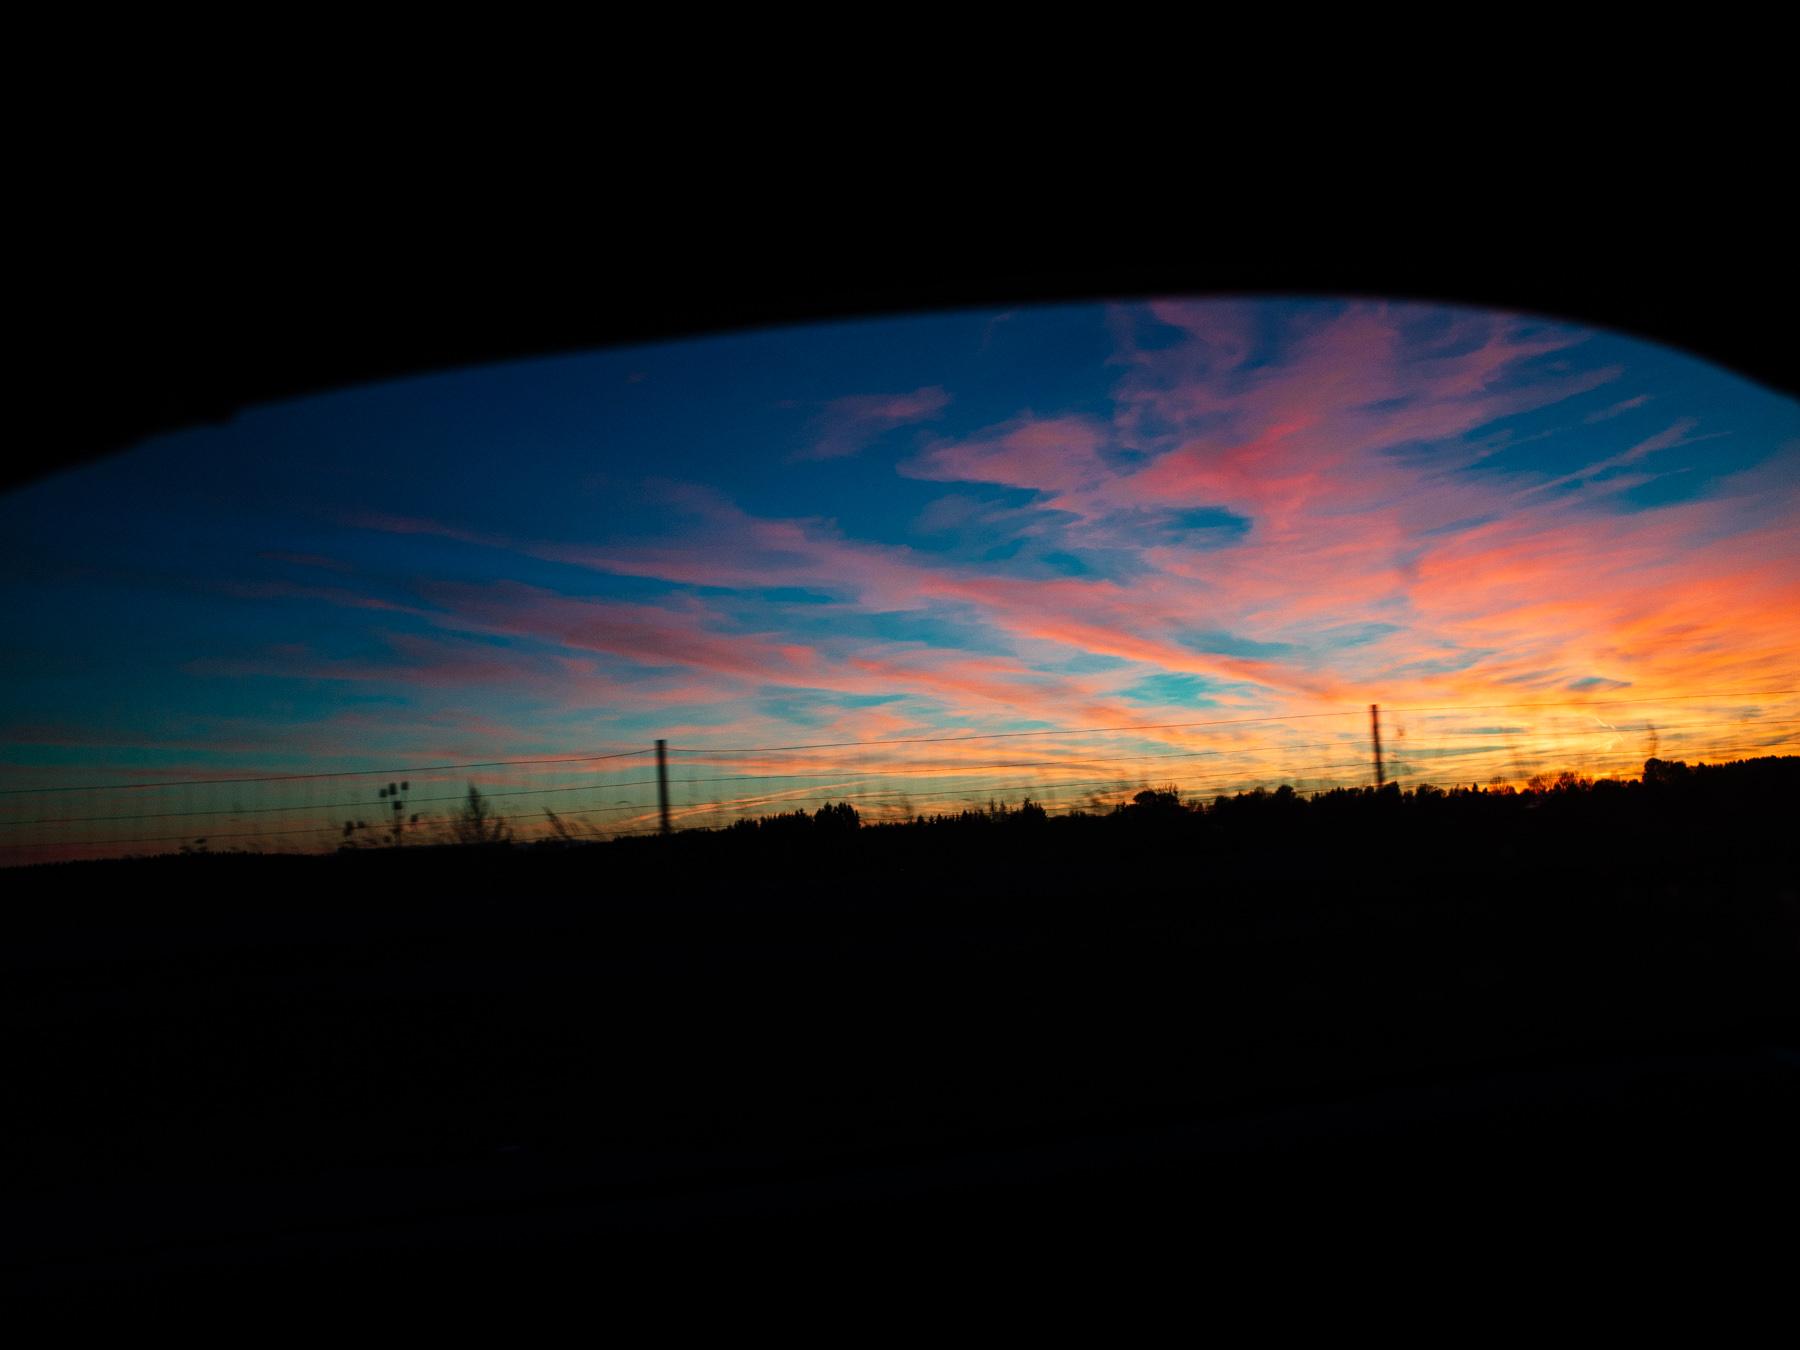 andre-duhme-fotograf-autobahn-mu%cc%88nchen_r014207